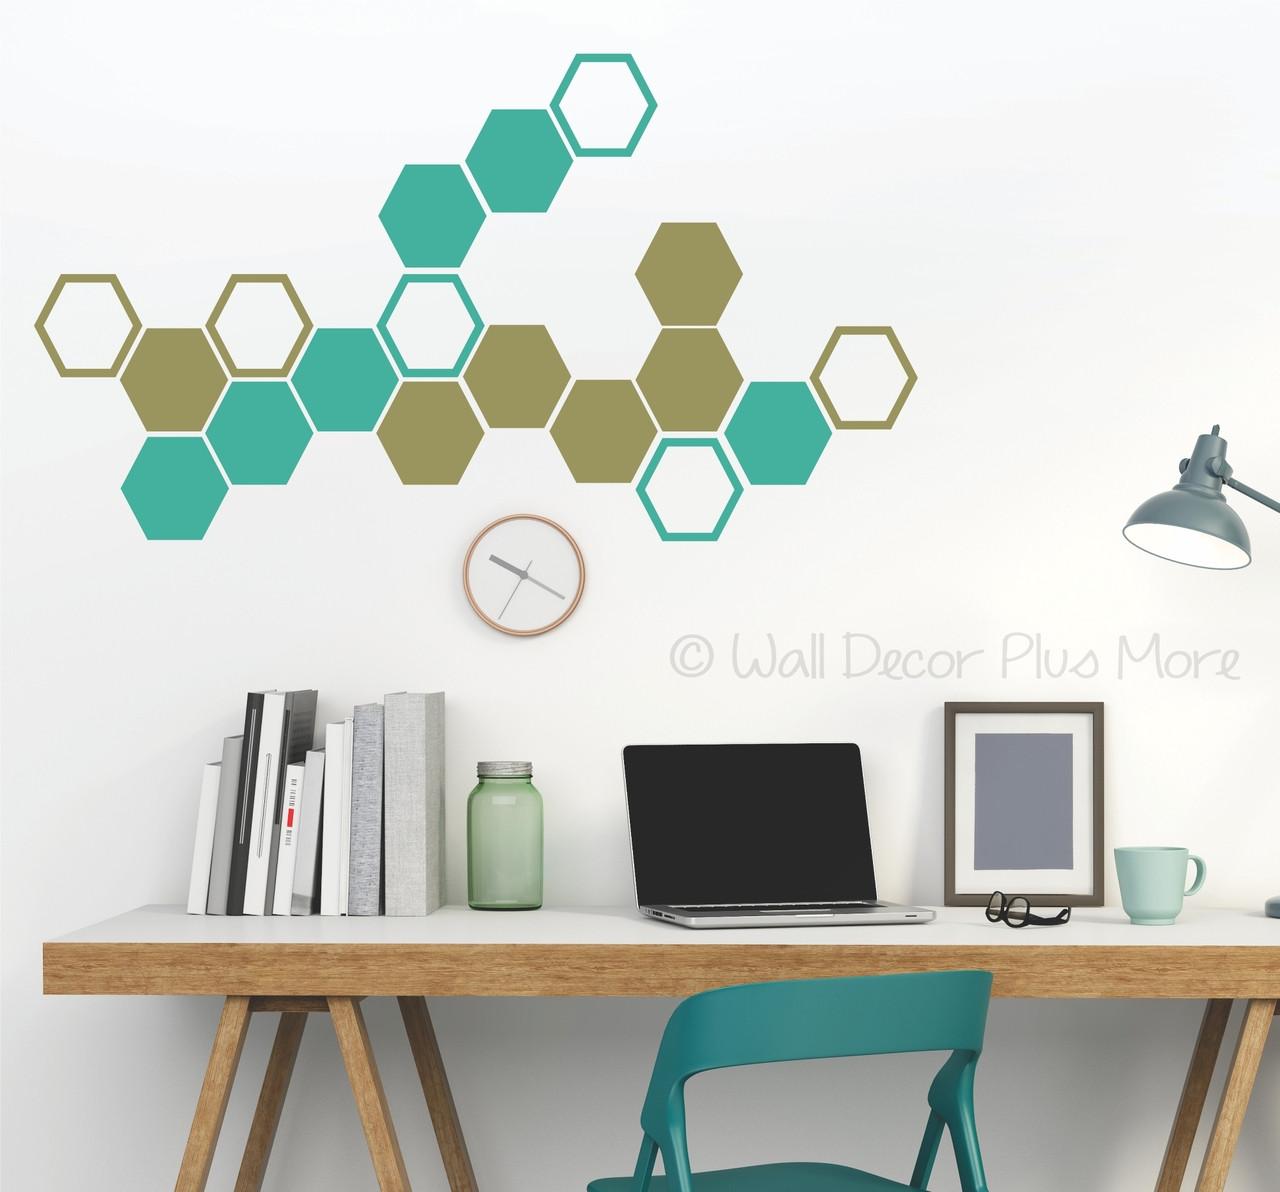 Honeycomb hexagon wall sticker shapes 2 color vinyl decals - Wall art decor ideas ...